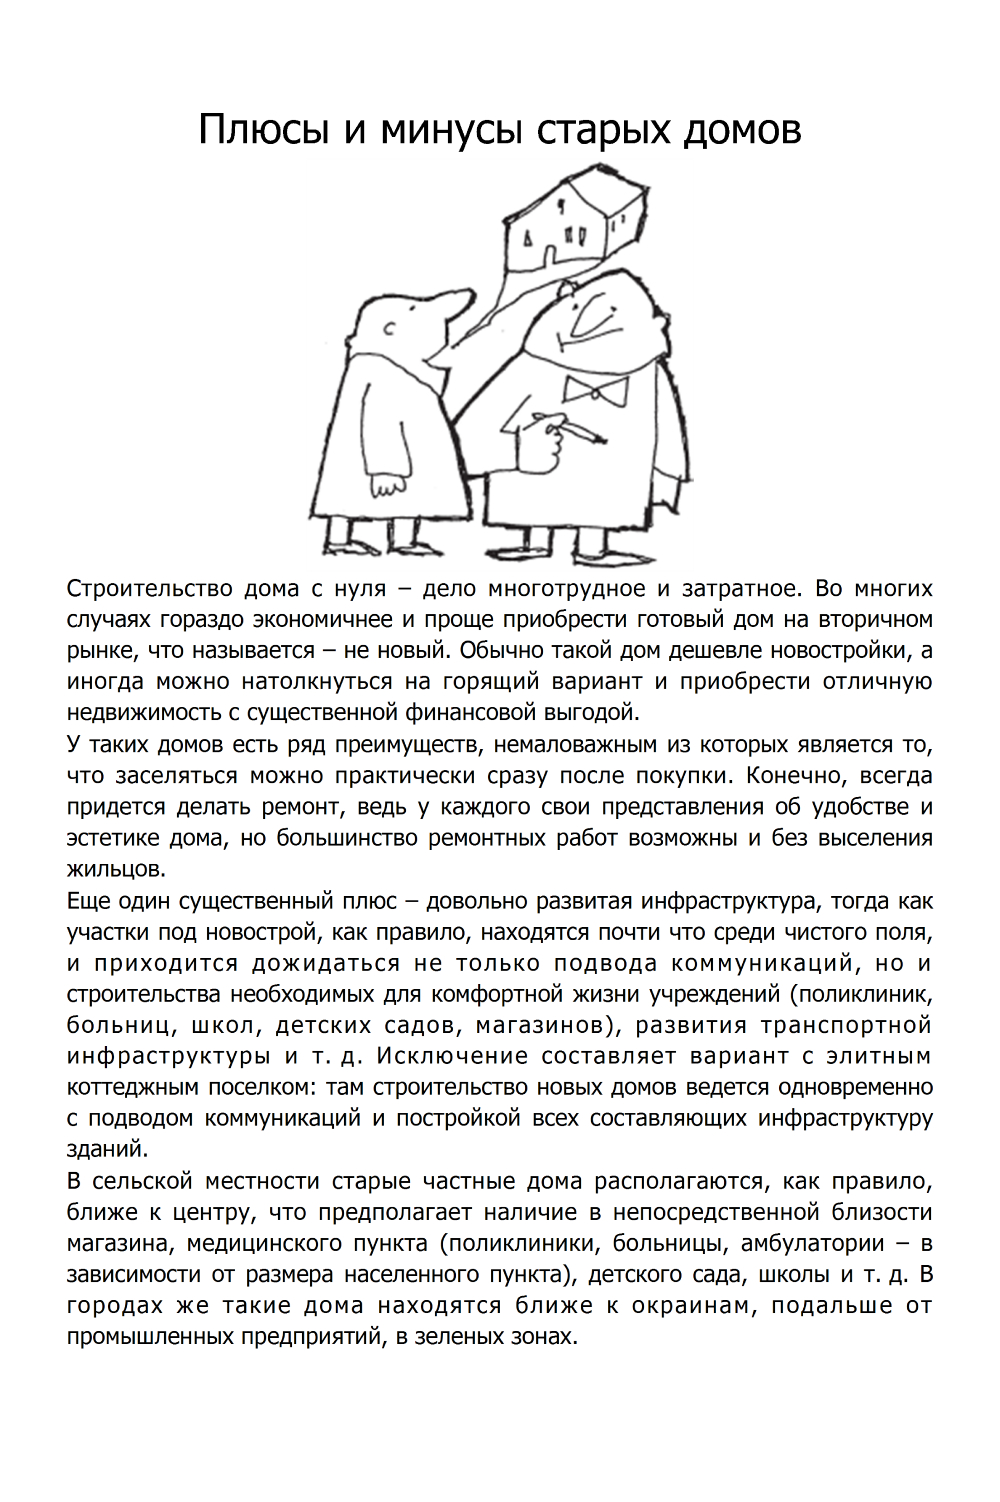 http://i2.imageban.ru/out/2013/12/03/4649859b3b578e7adf84b78ff1e112ae.jpg